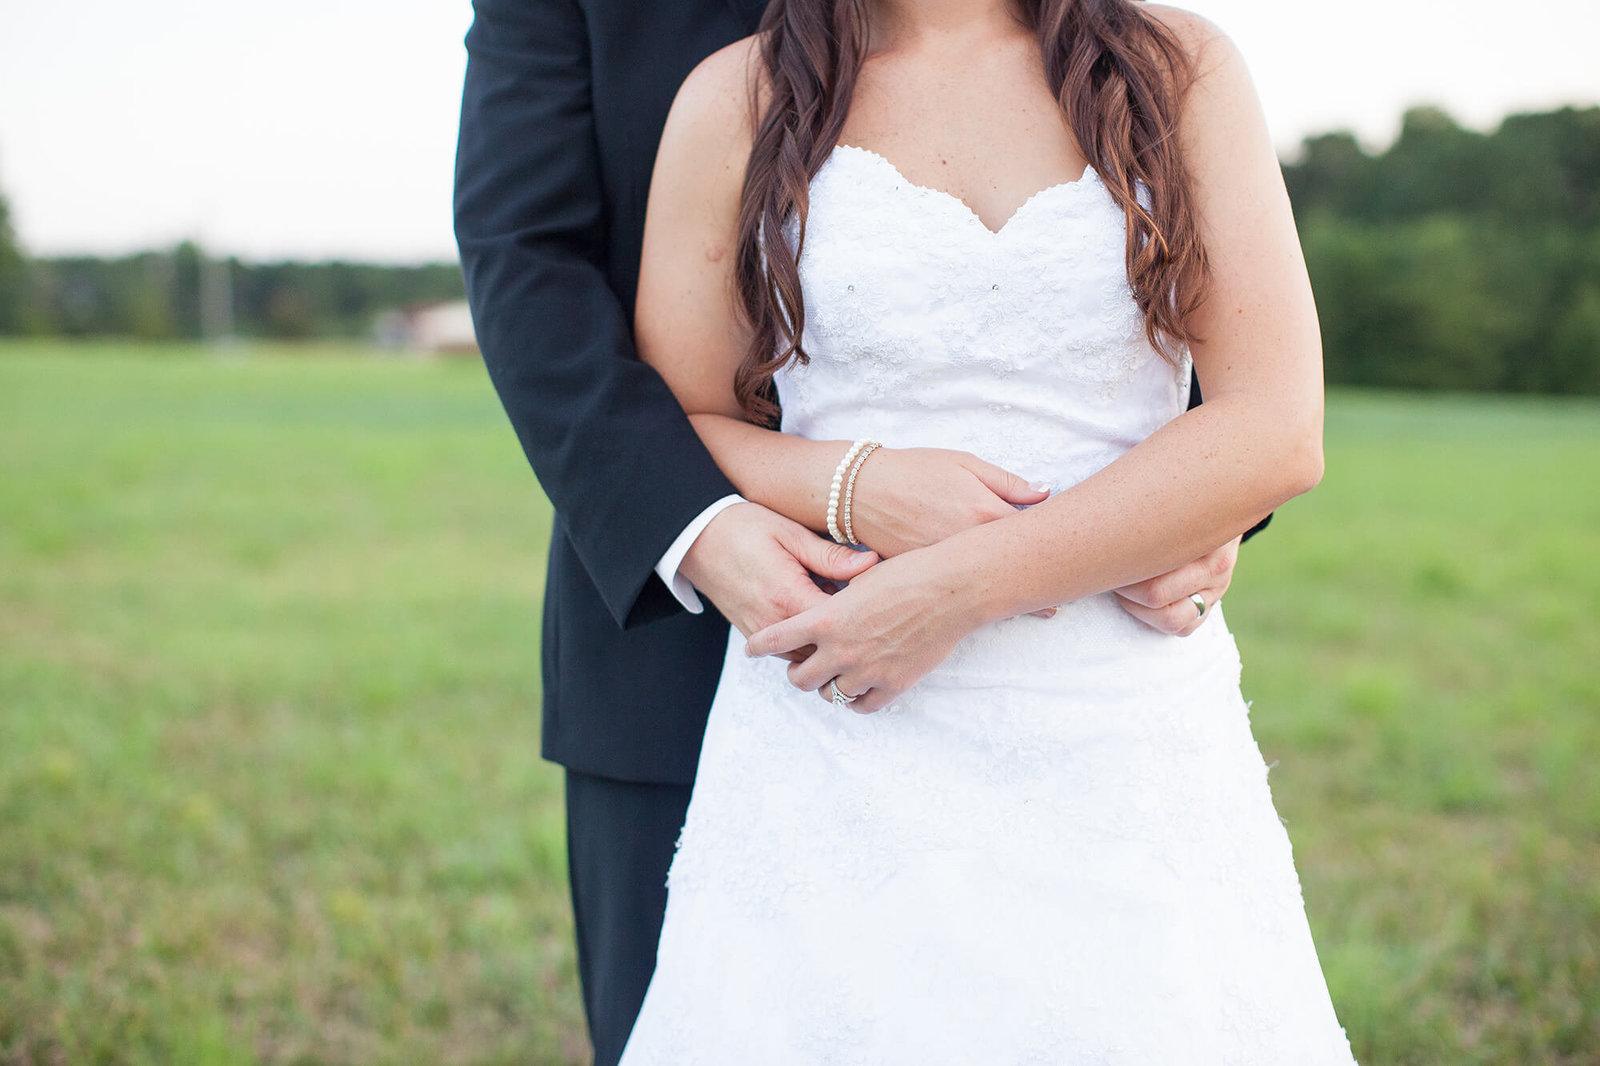 SCWeddingPhotography-Fine-Art-Portrait-Photography-JessicaHuntPhotography-Wedding-2015-106